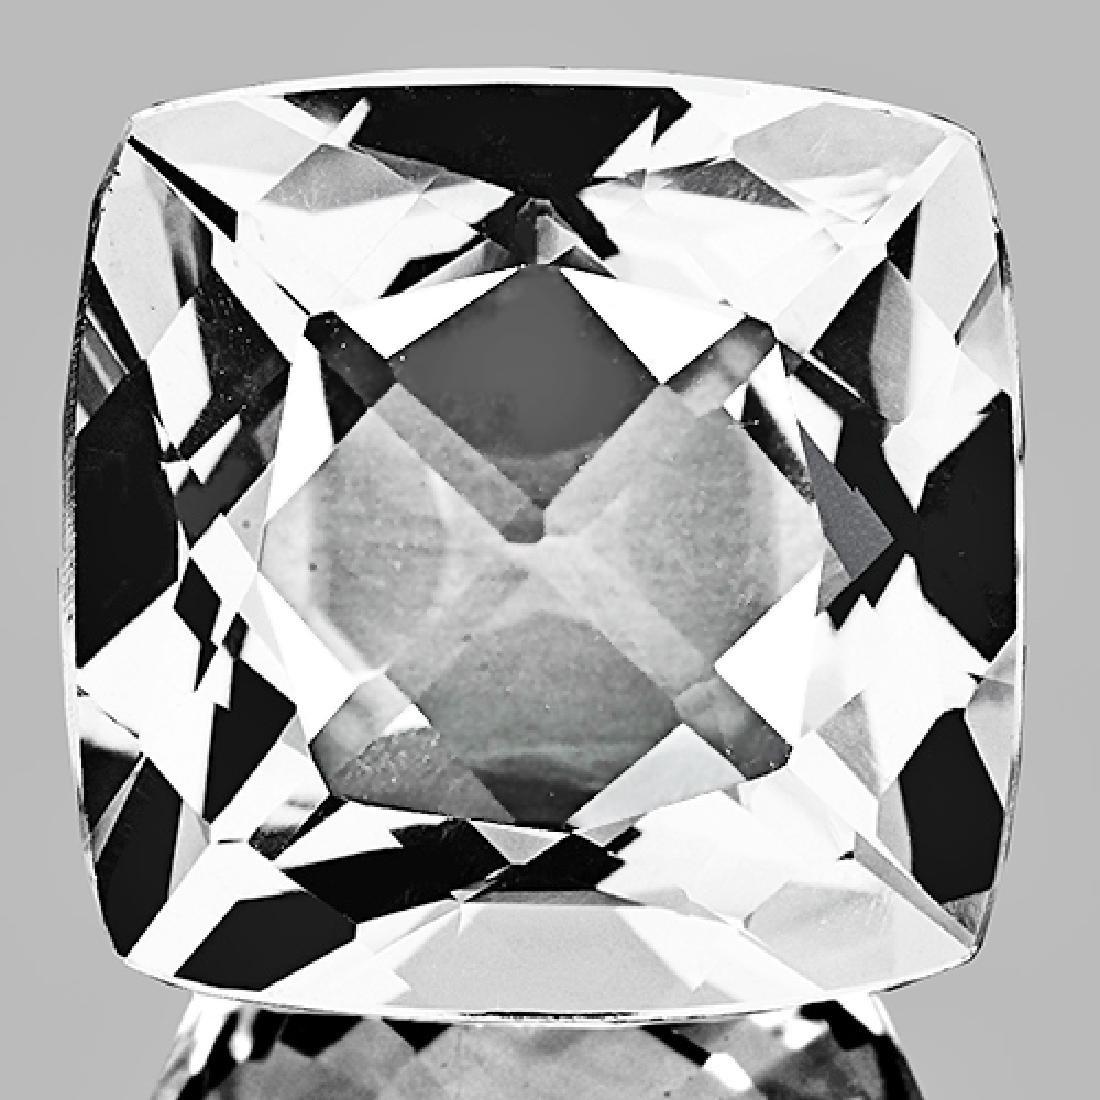 Natural Healing Colorless Quartz (Rock Crystal) 35.7Cts